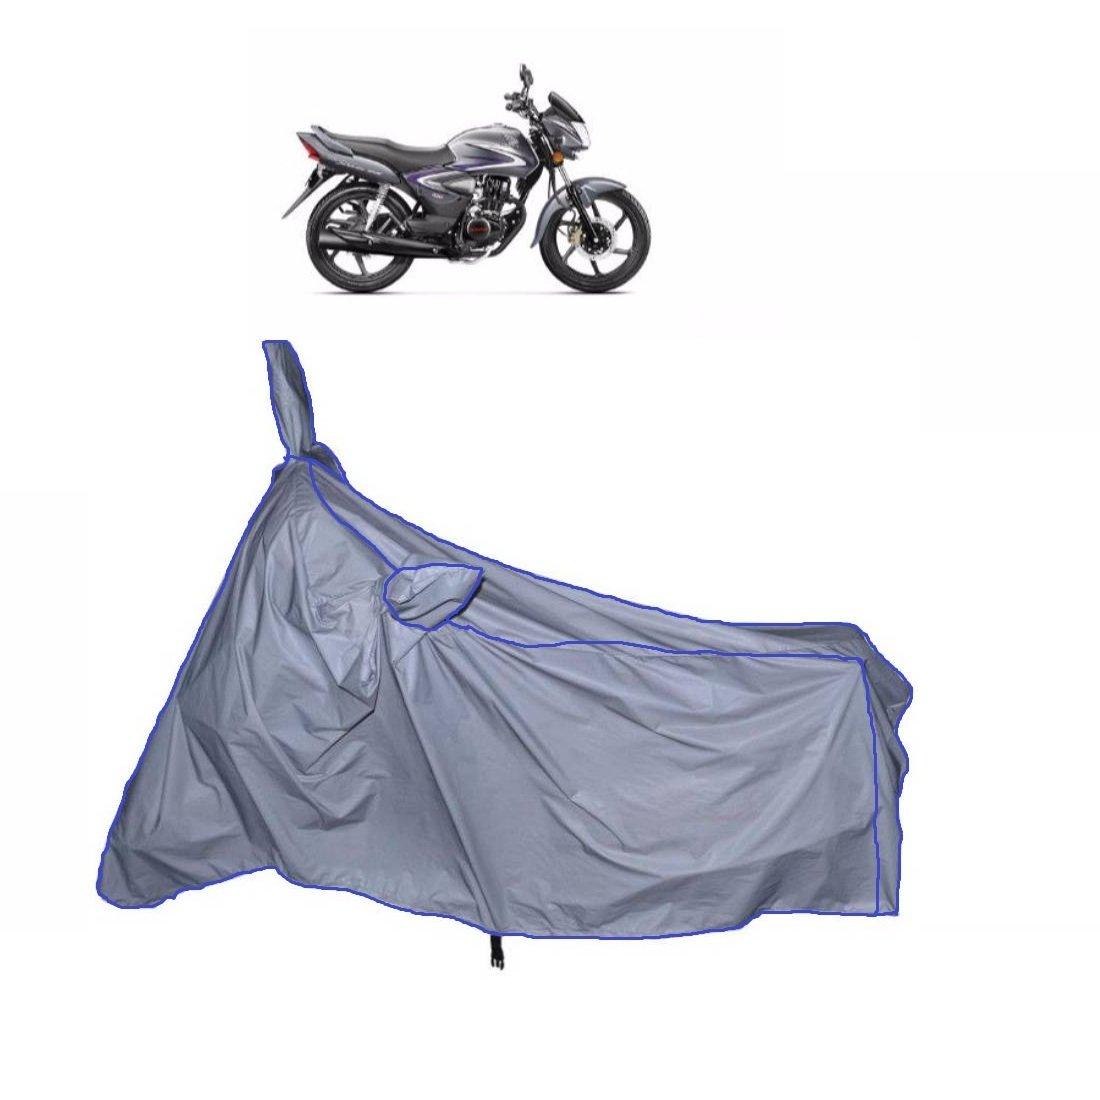 Fabtec Waterproof Bike Body Cover For Honda Shine Heavy With Microfiber Glove Combo( Multicolour)